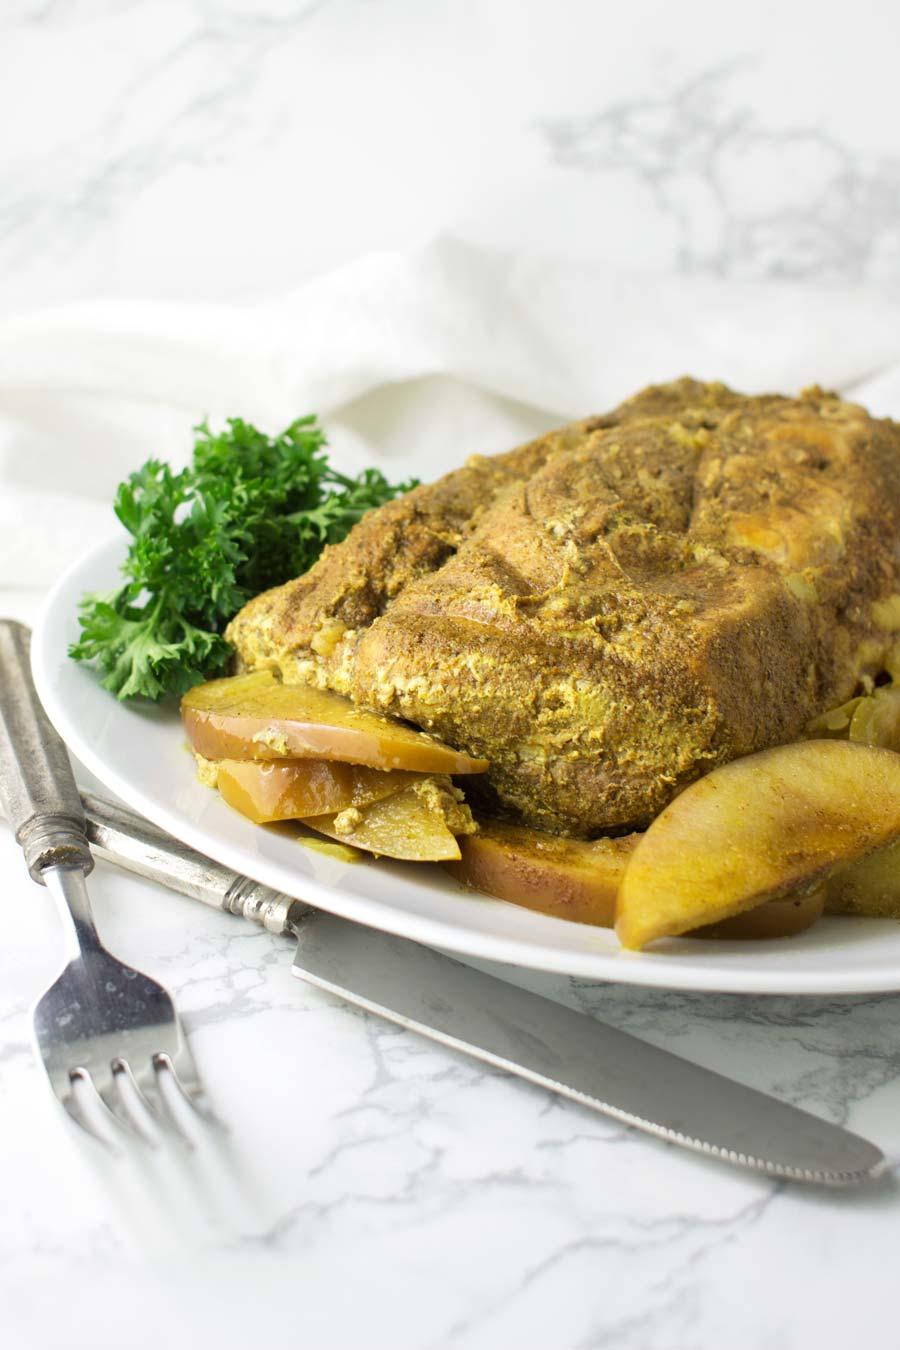 Cinnamon-Apple Pork Roast recipe from acleanplate.com #paleo #aip #glutenfree